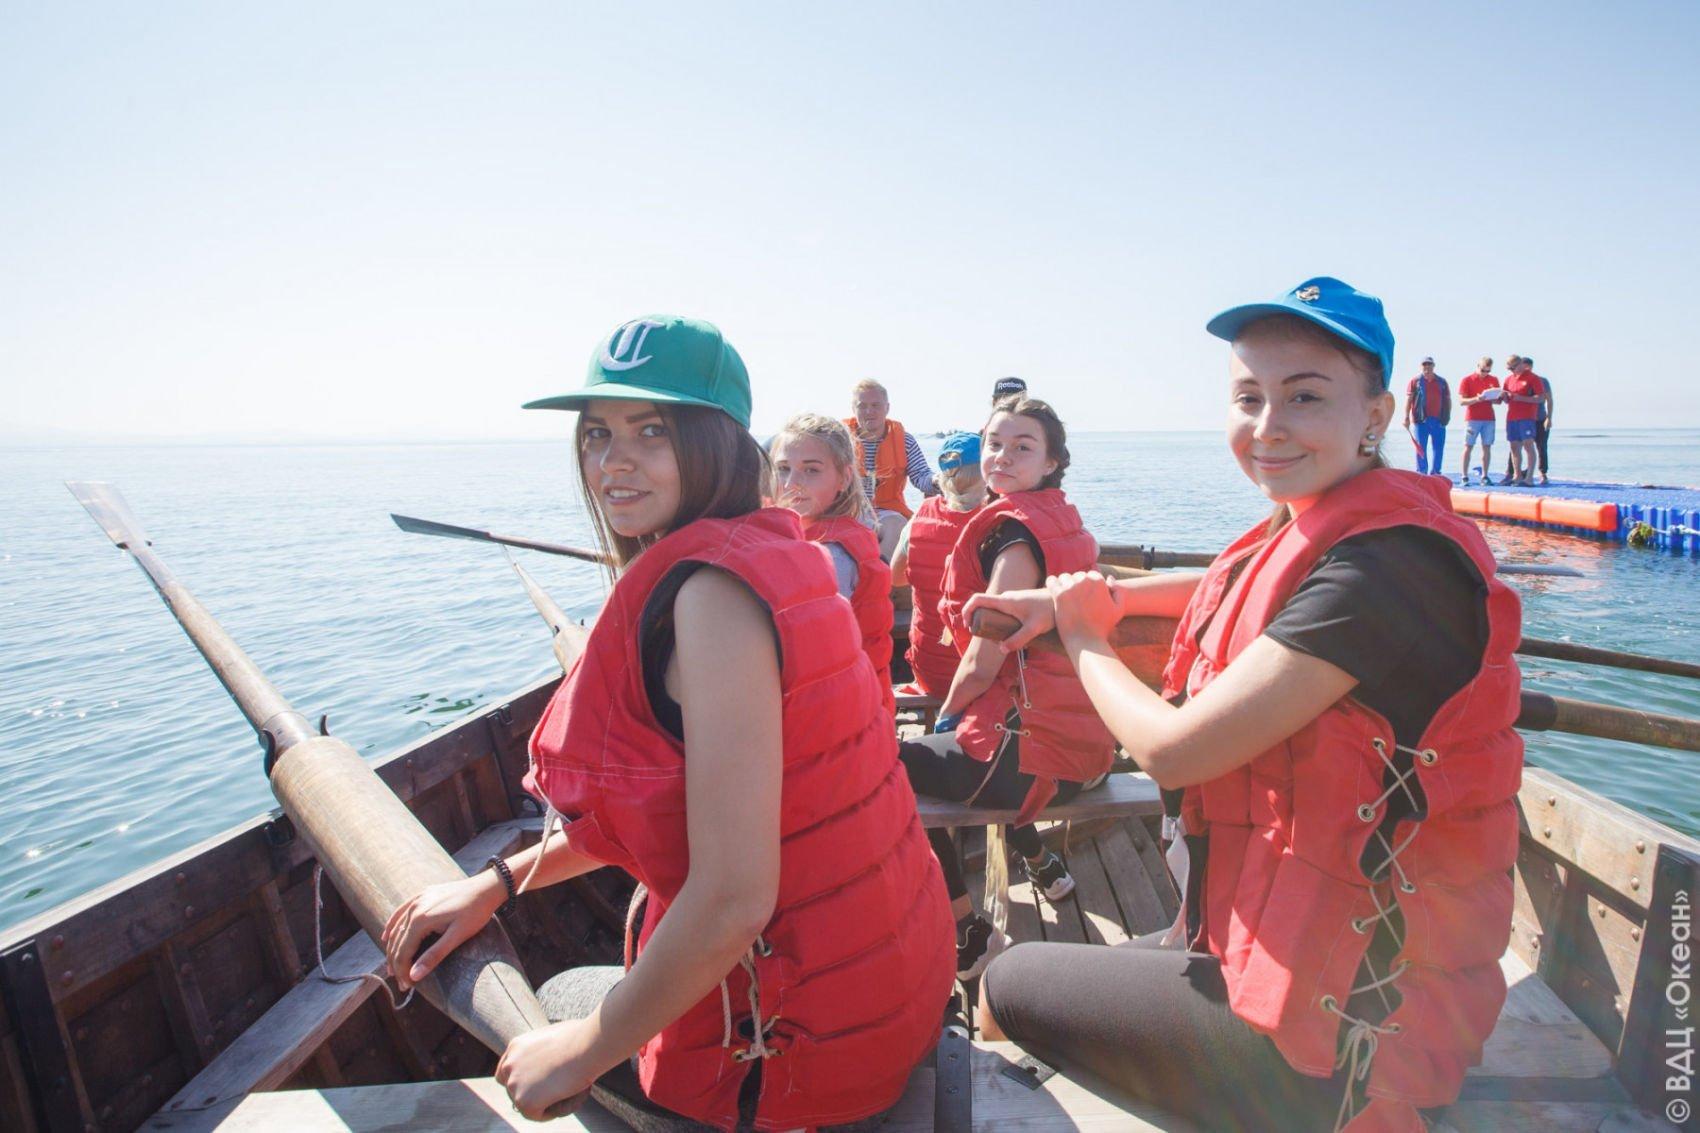 просто снимает морское многоборье самара фото вероника